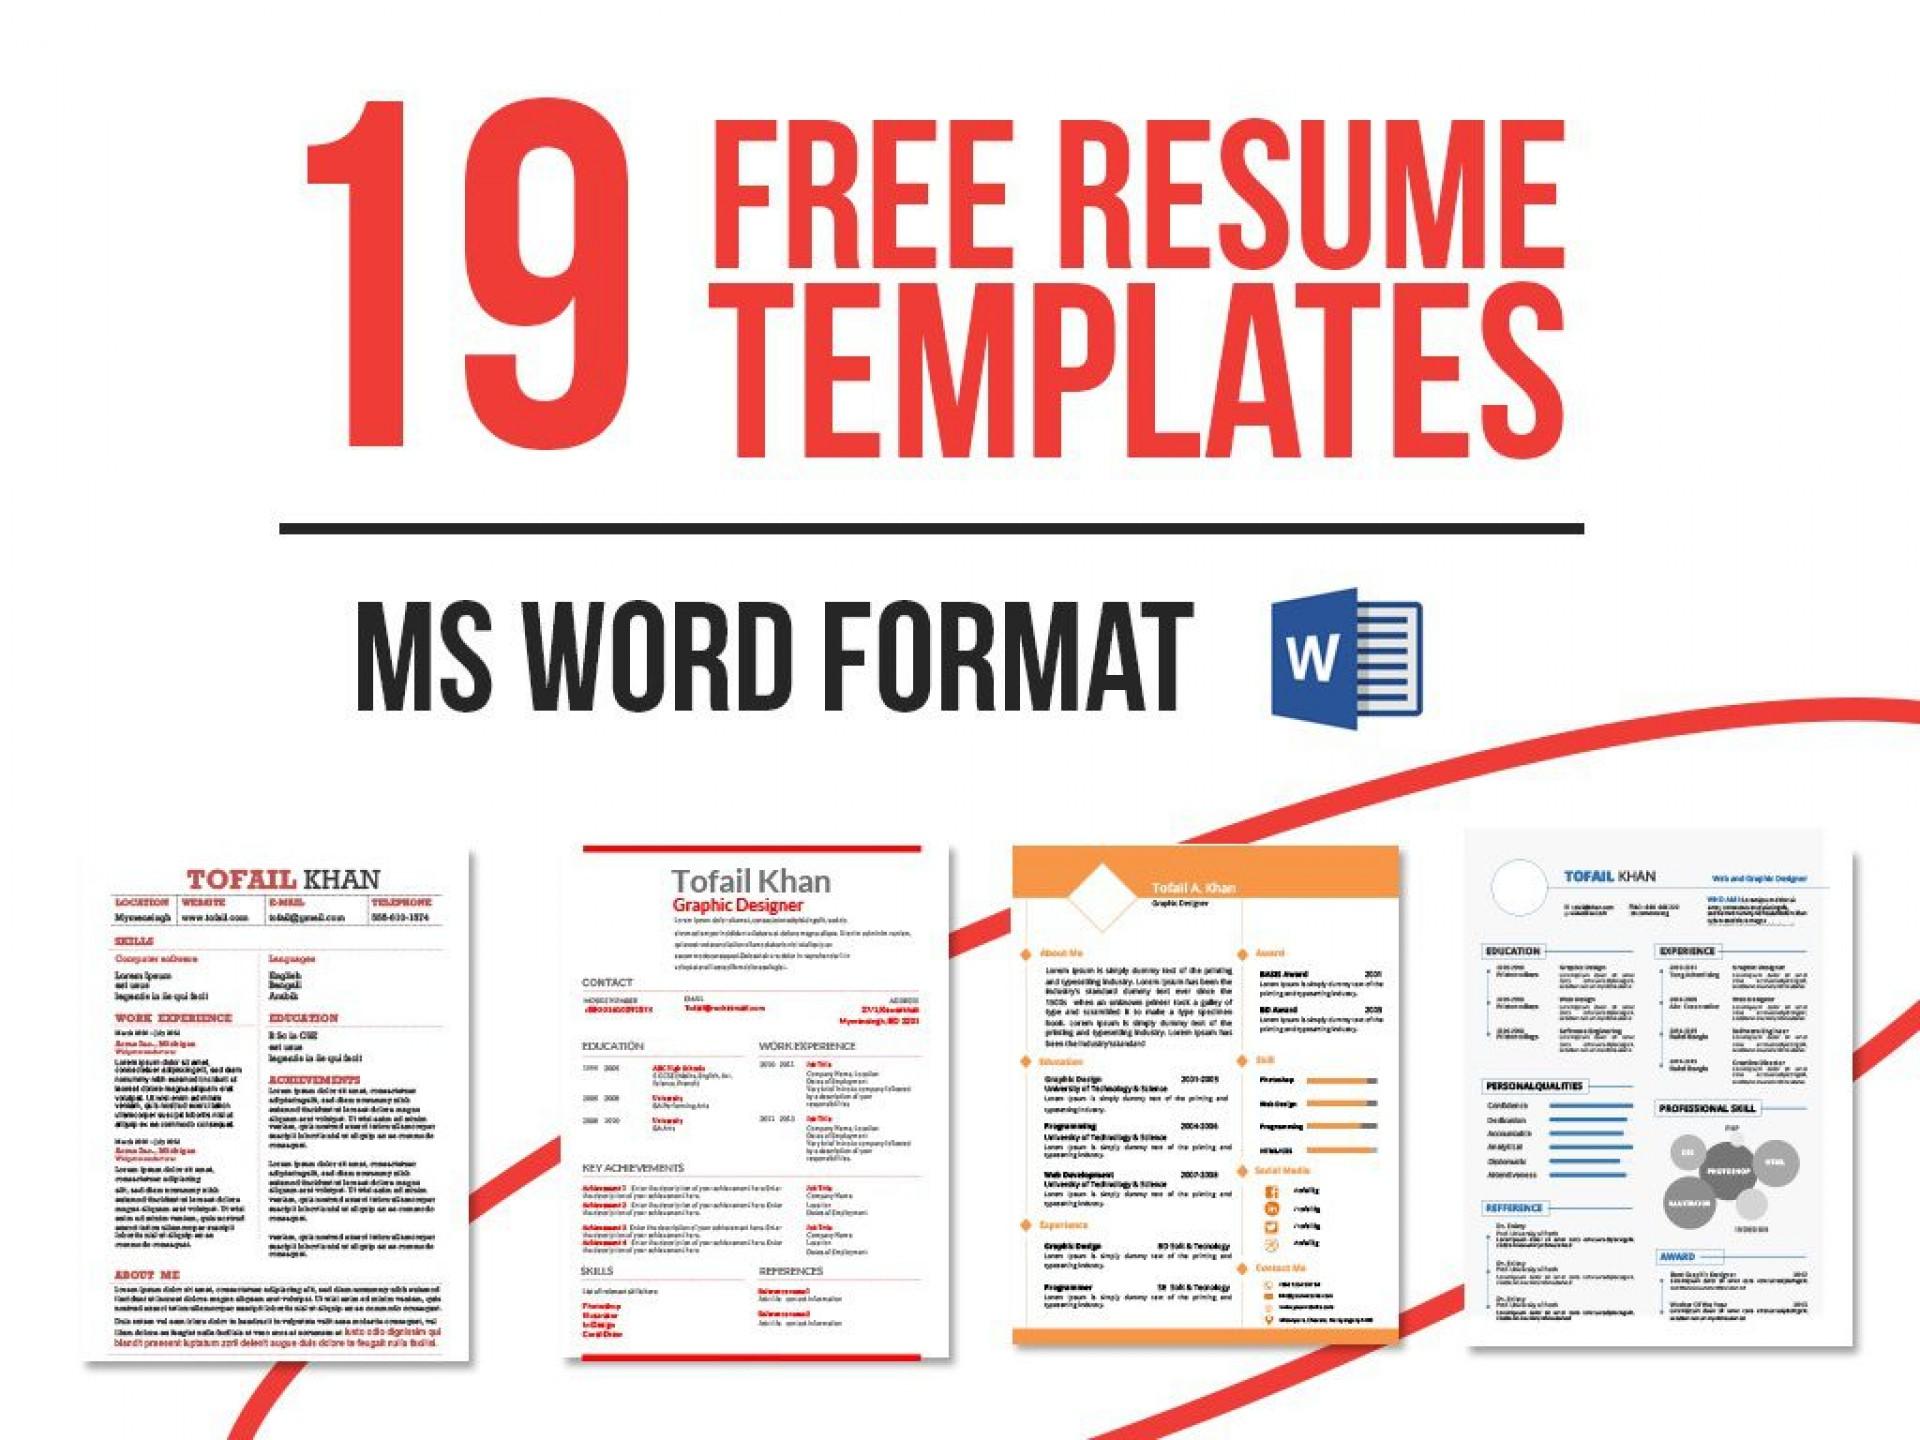 003 Wonderful Resume Template Free Word Download Image  Cv With Photo Malaysia Australia1920